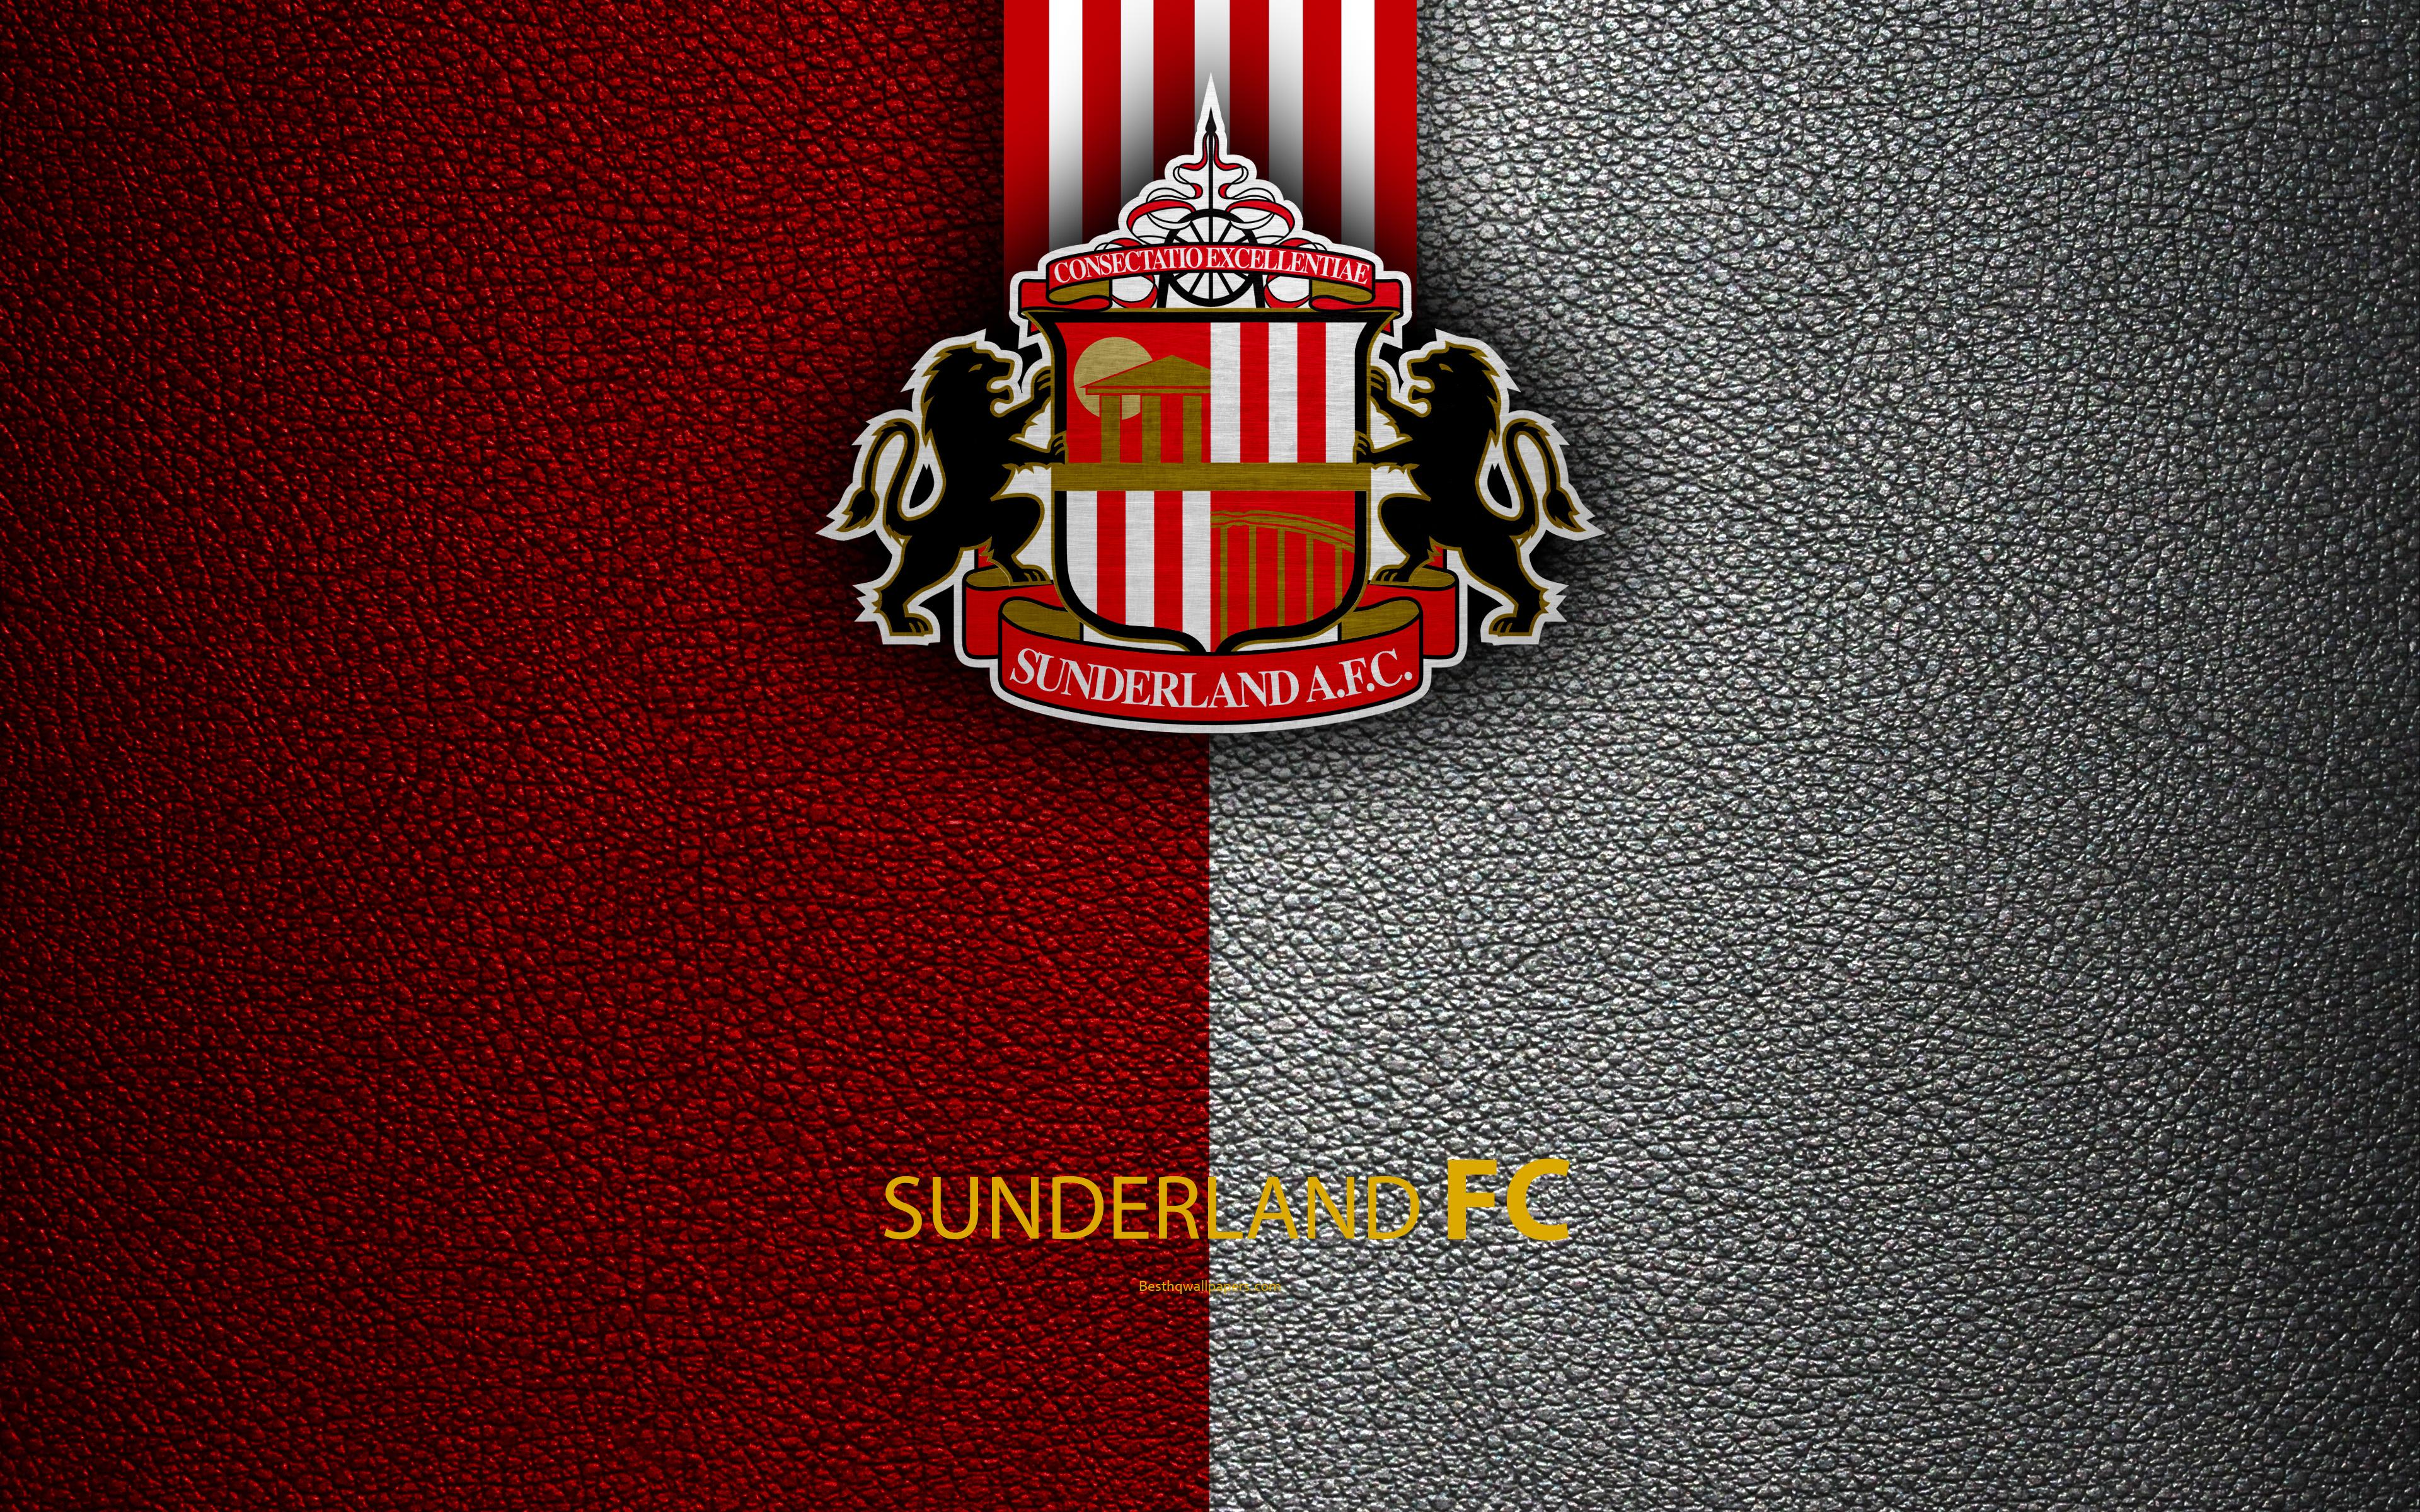 Download wallpapers Sunderland FC 4K English football club logo 3840x2400